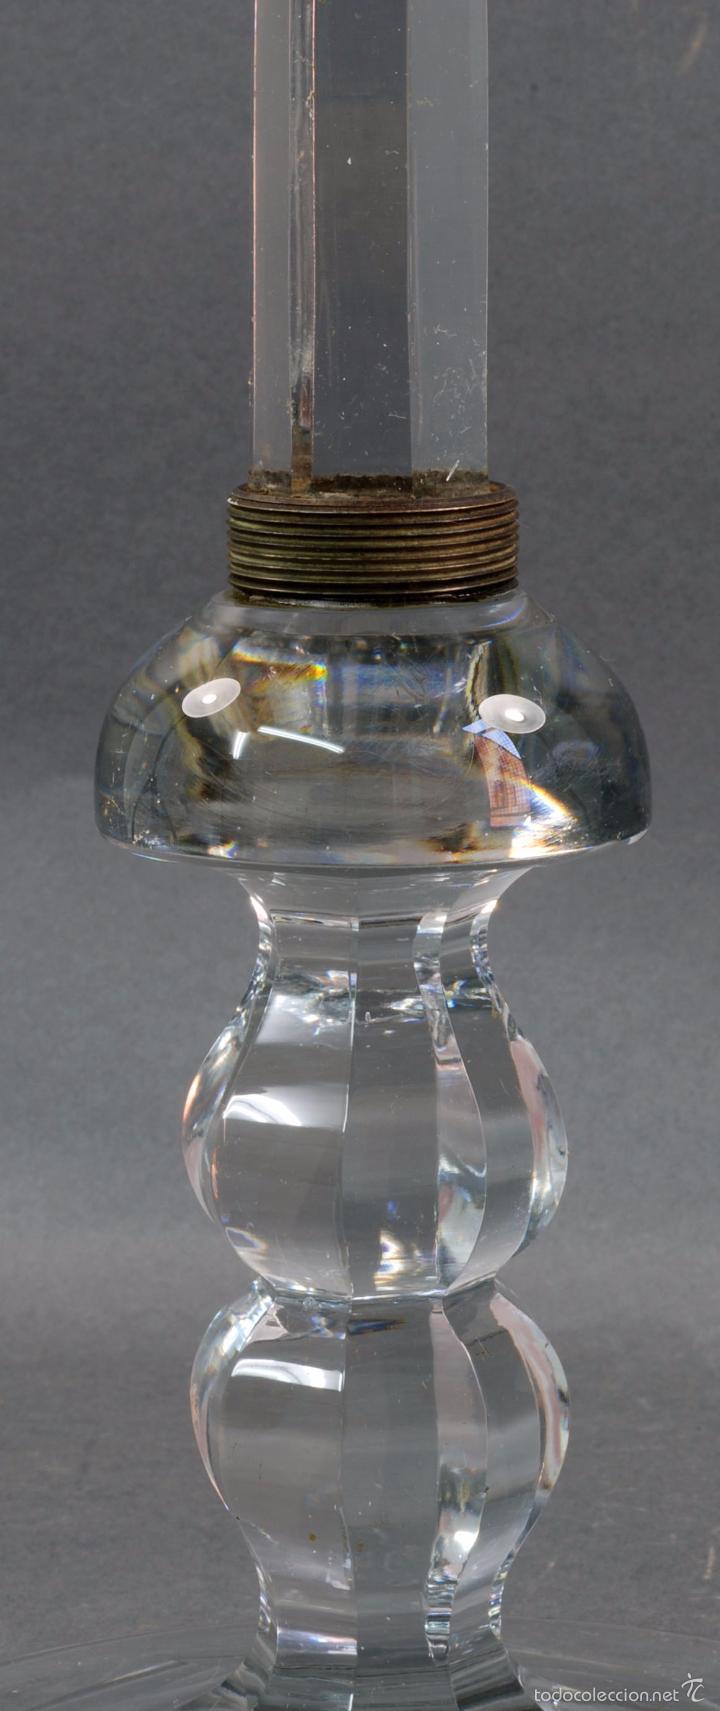 Antigüedades: Frutero dulcera cristal Baccarat PP S XX - Foto 4 - 58262291